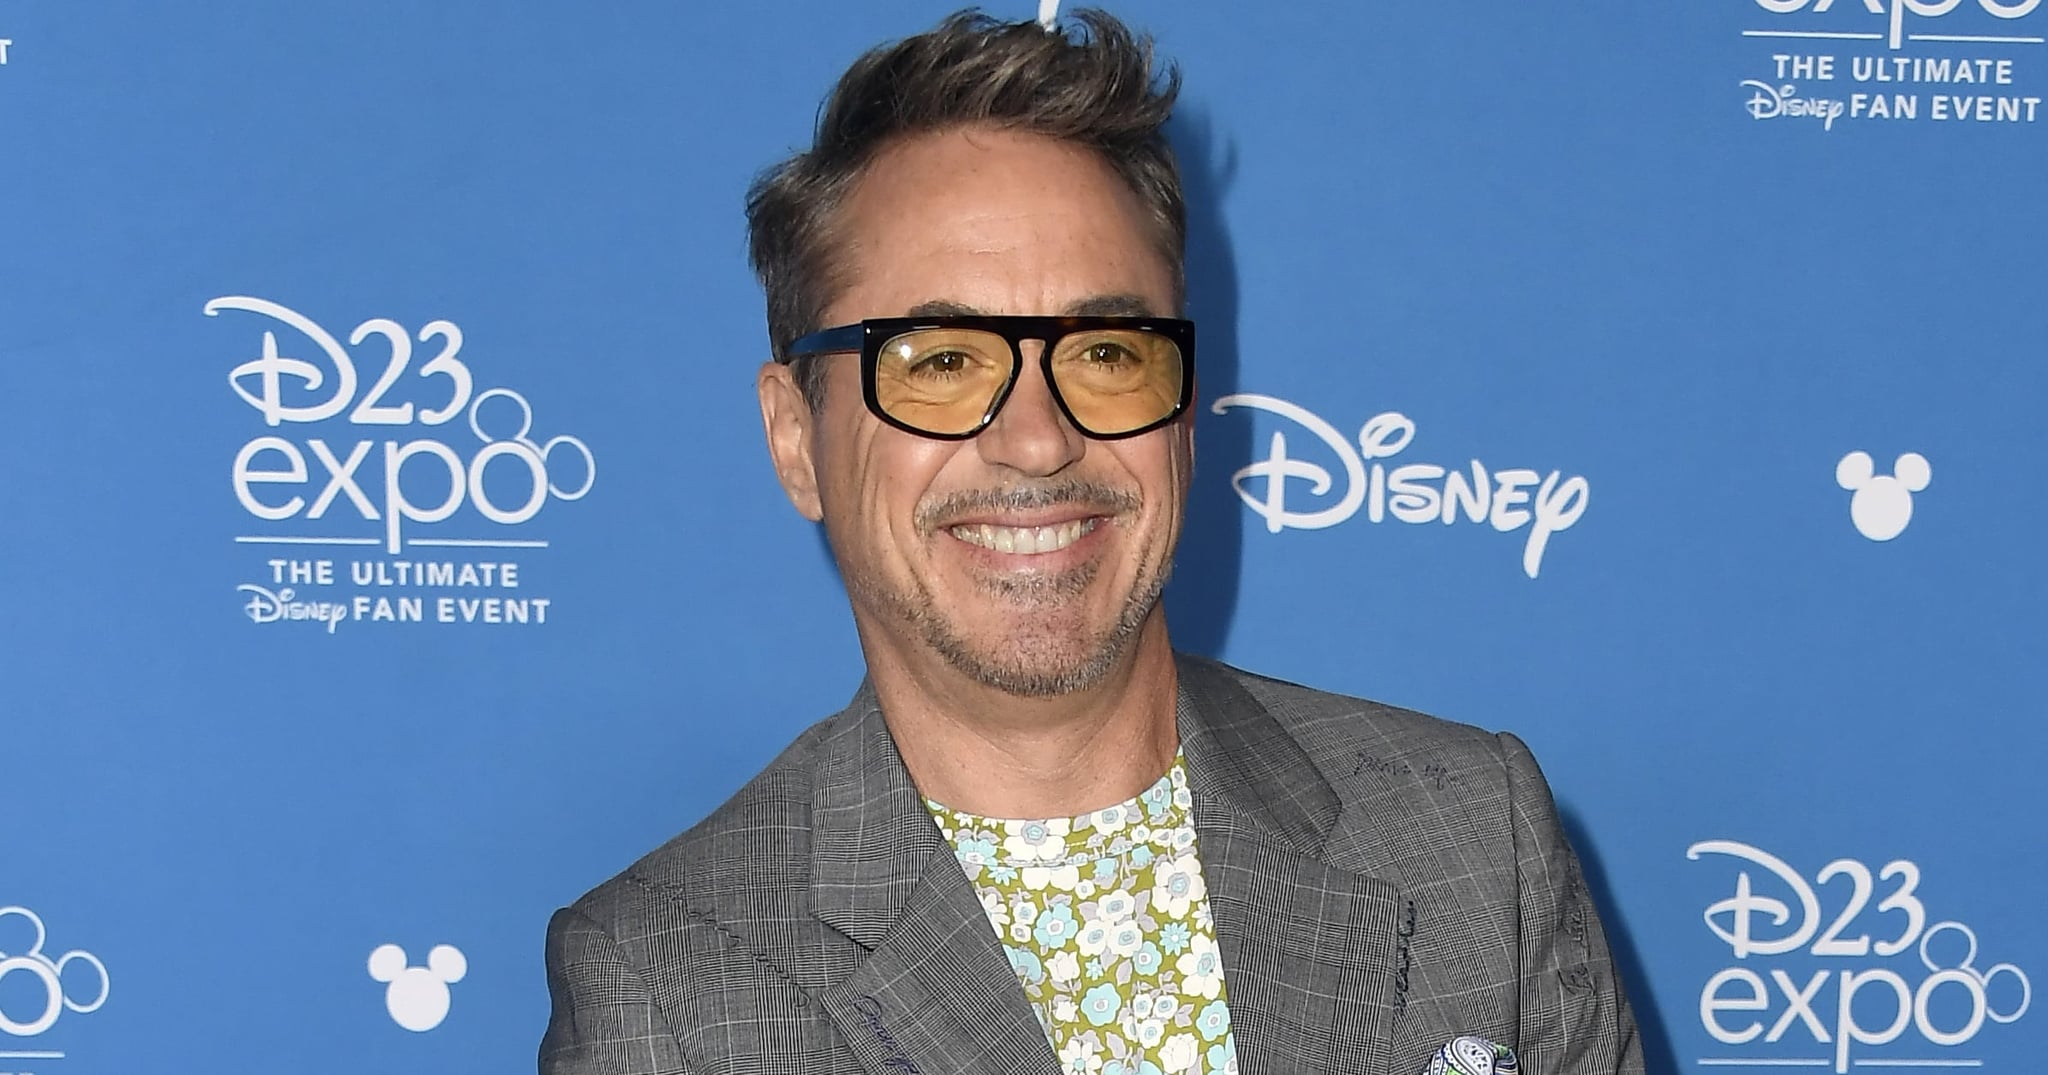 Robert Downey Jr. Reveals He Was Once Arrested at Disneyland